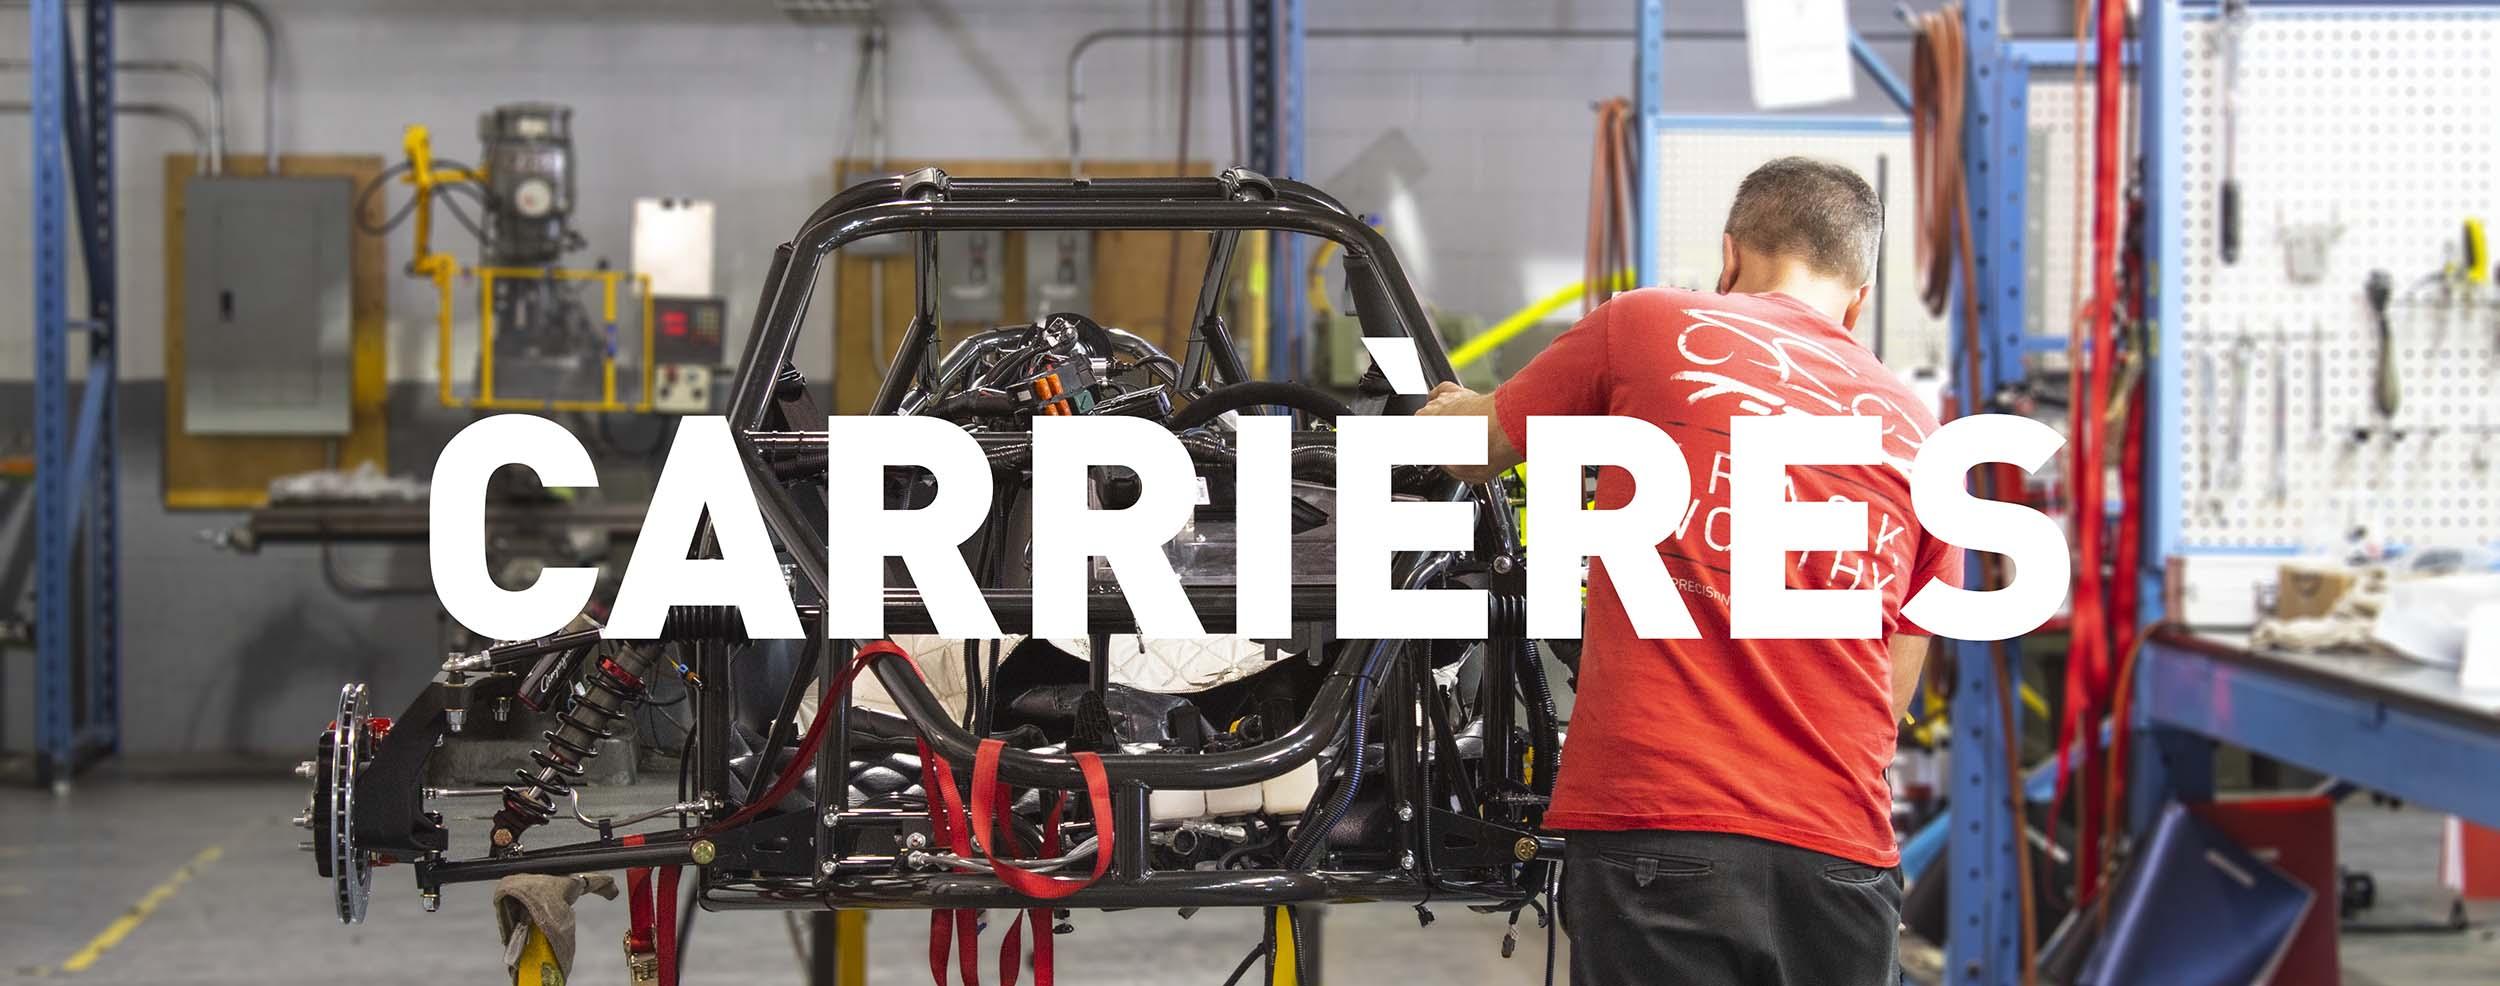 carrières-campagna-motors-ressources-humaines